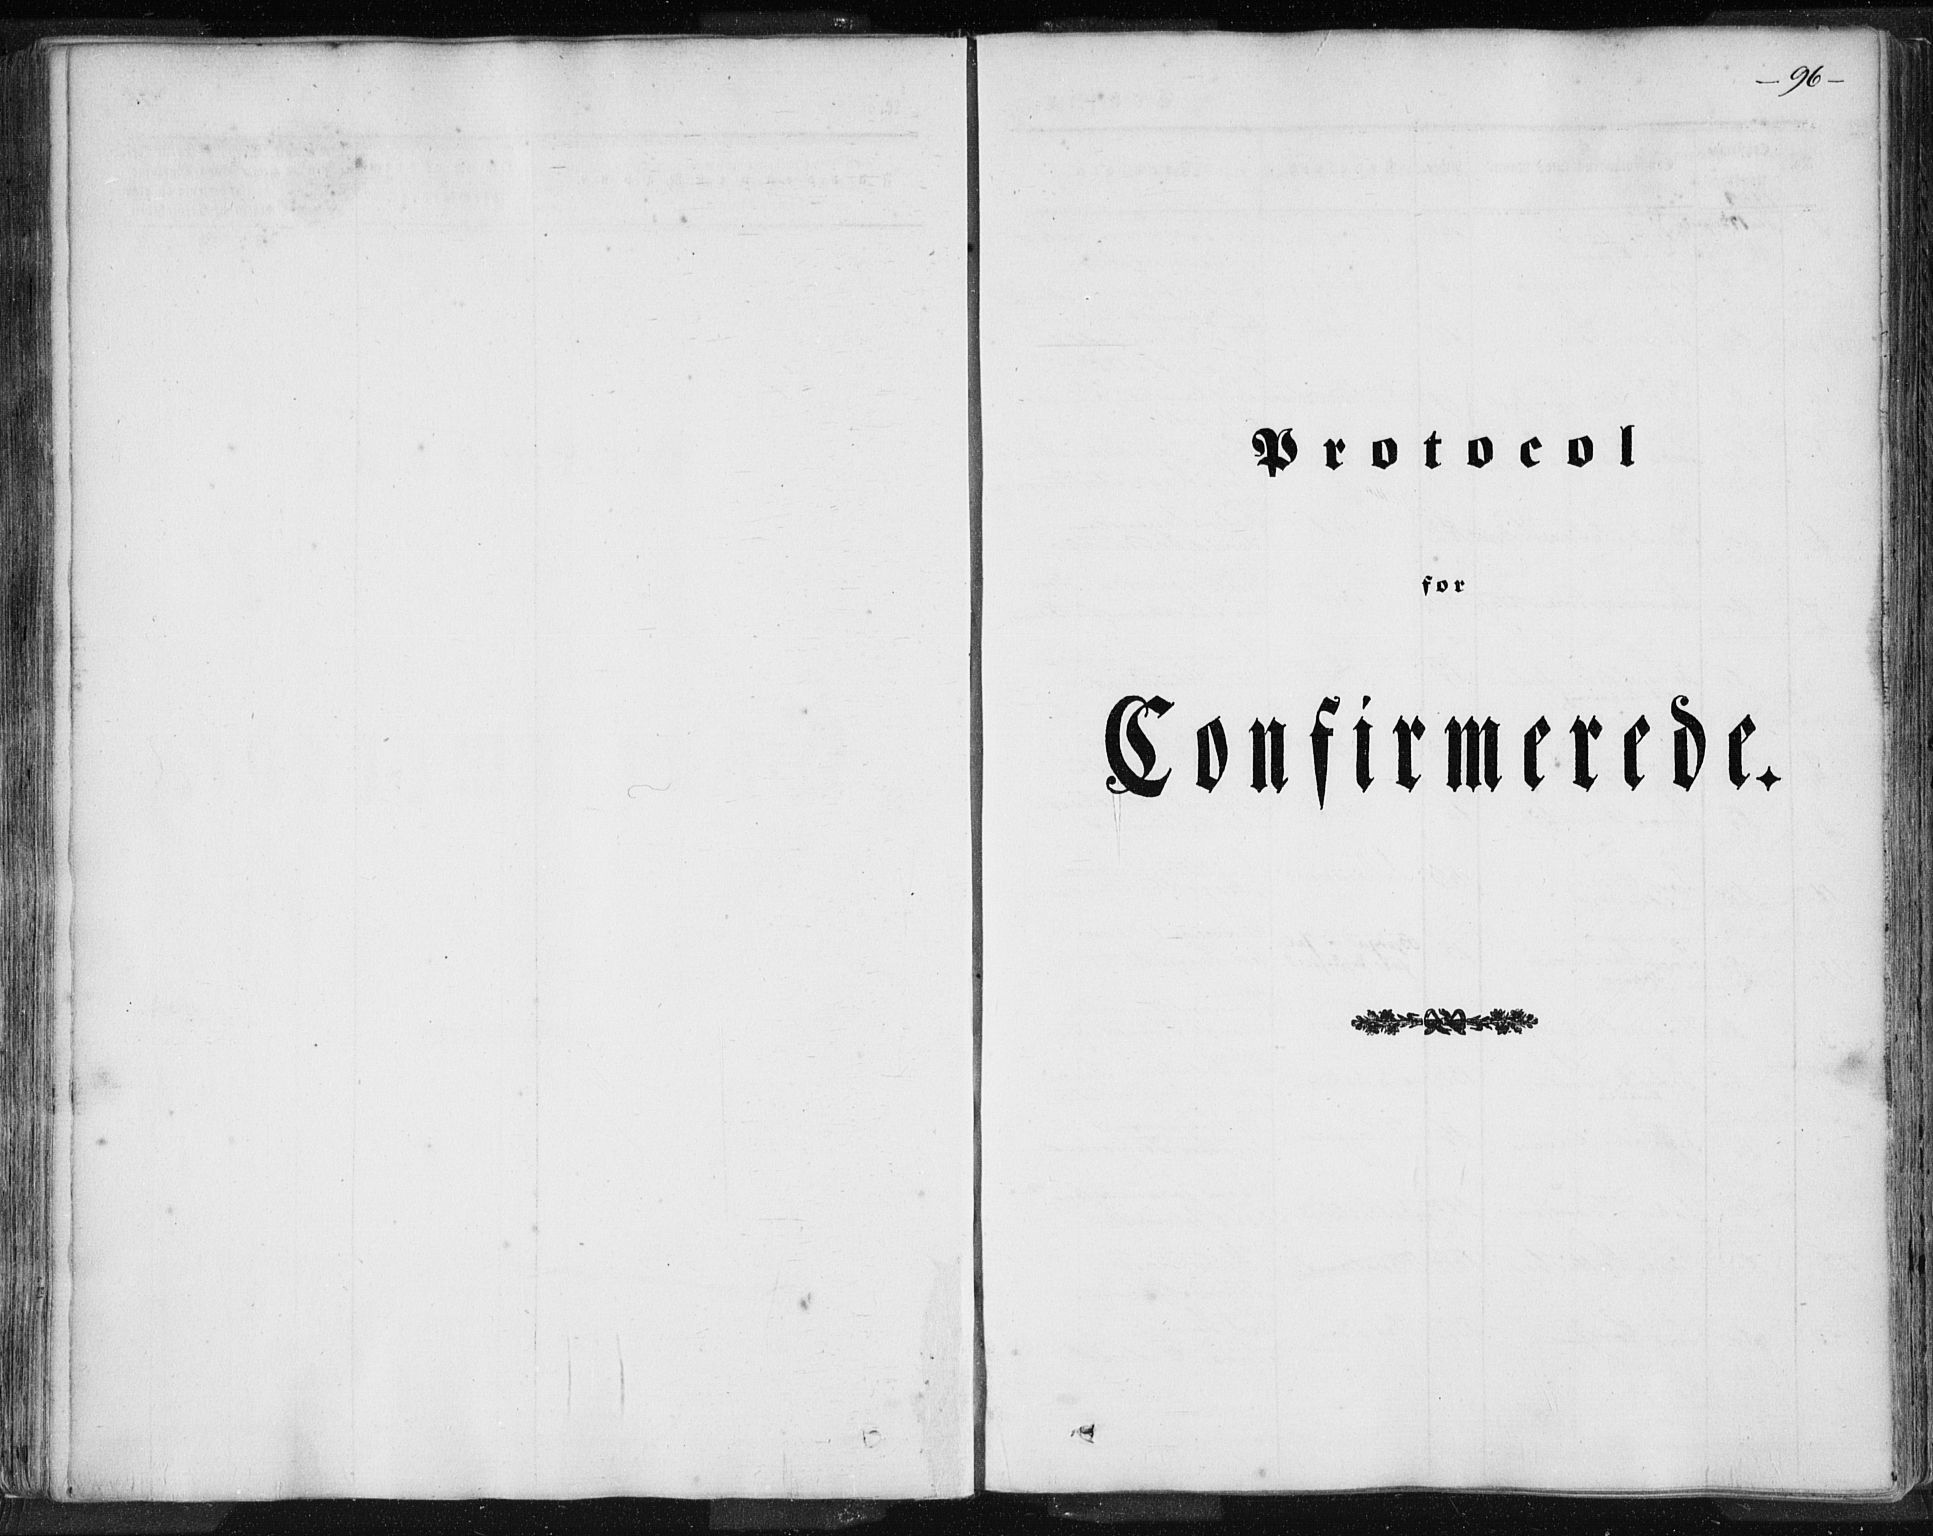 SAST, Skudenes sokneprestkontor, H/Ha/Haa/L0002: Ministerialbok nr. A 2.1, 1841-1846, s. 96